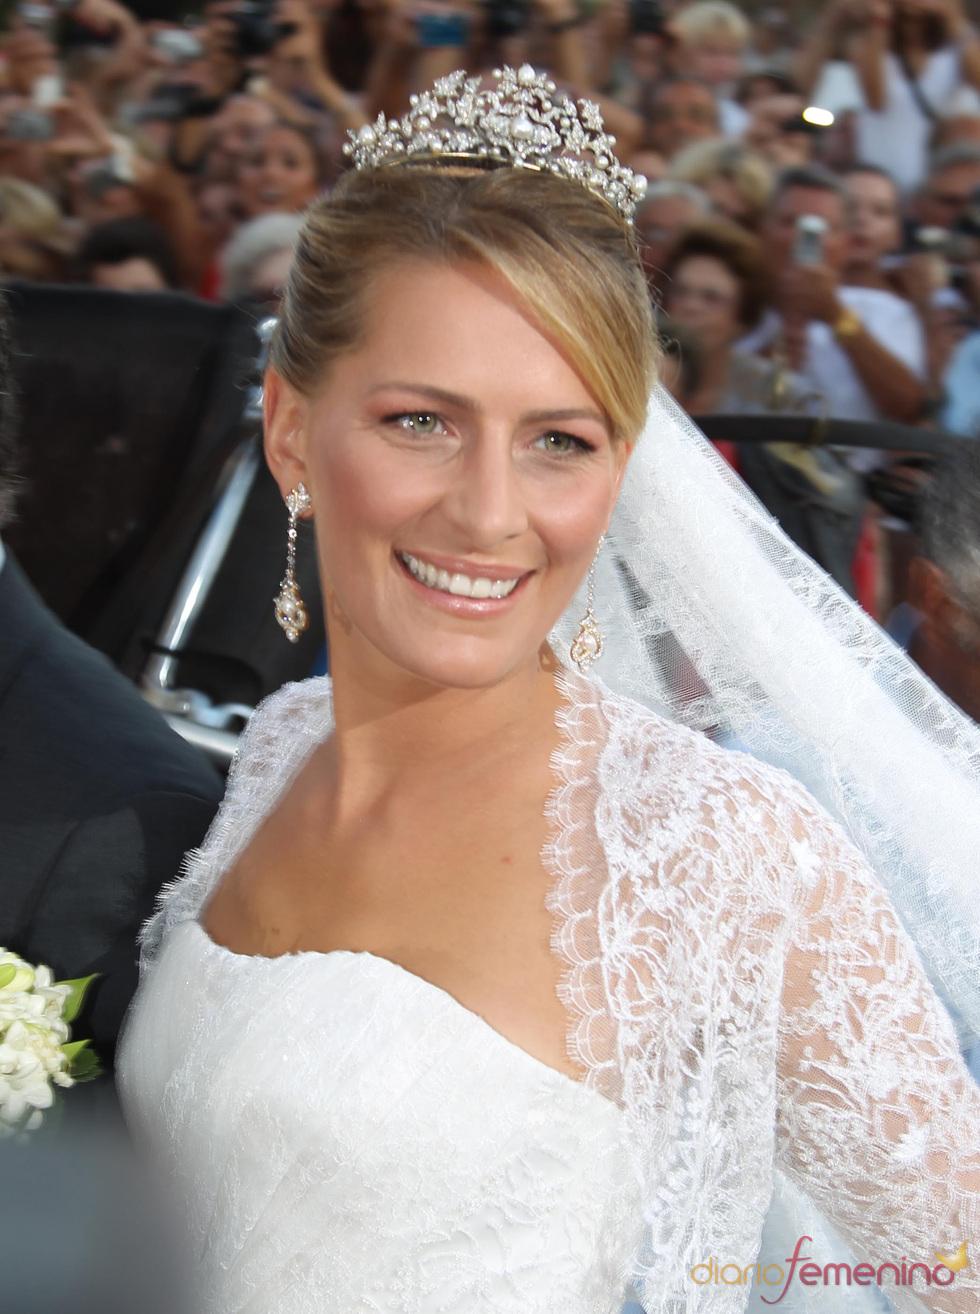 La radiante novia Tatiana Blatnik